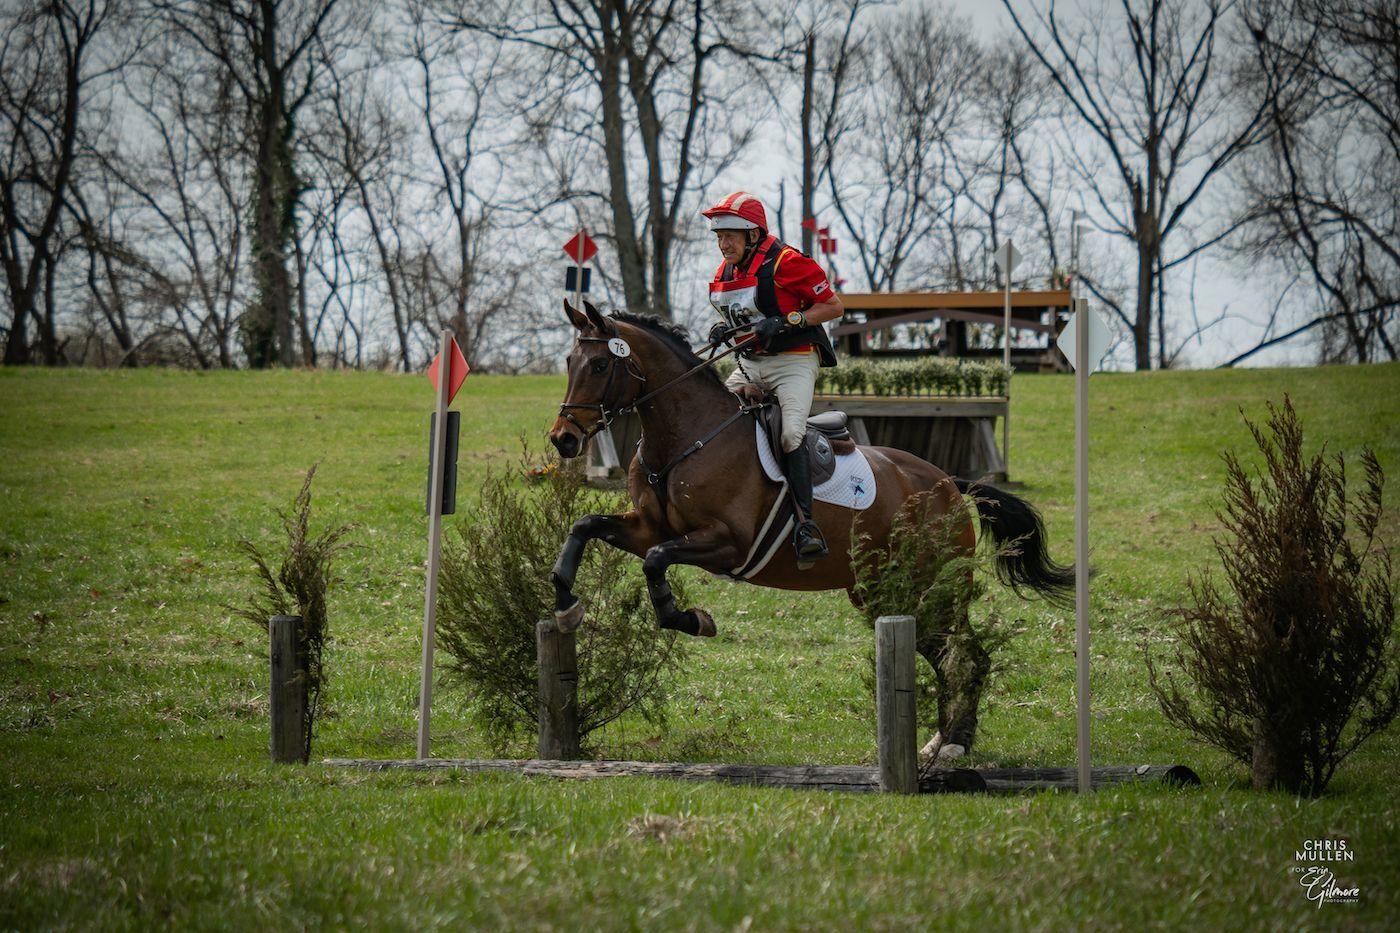 Morven Park hosts annual Spring Horse Trials